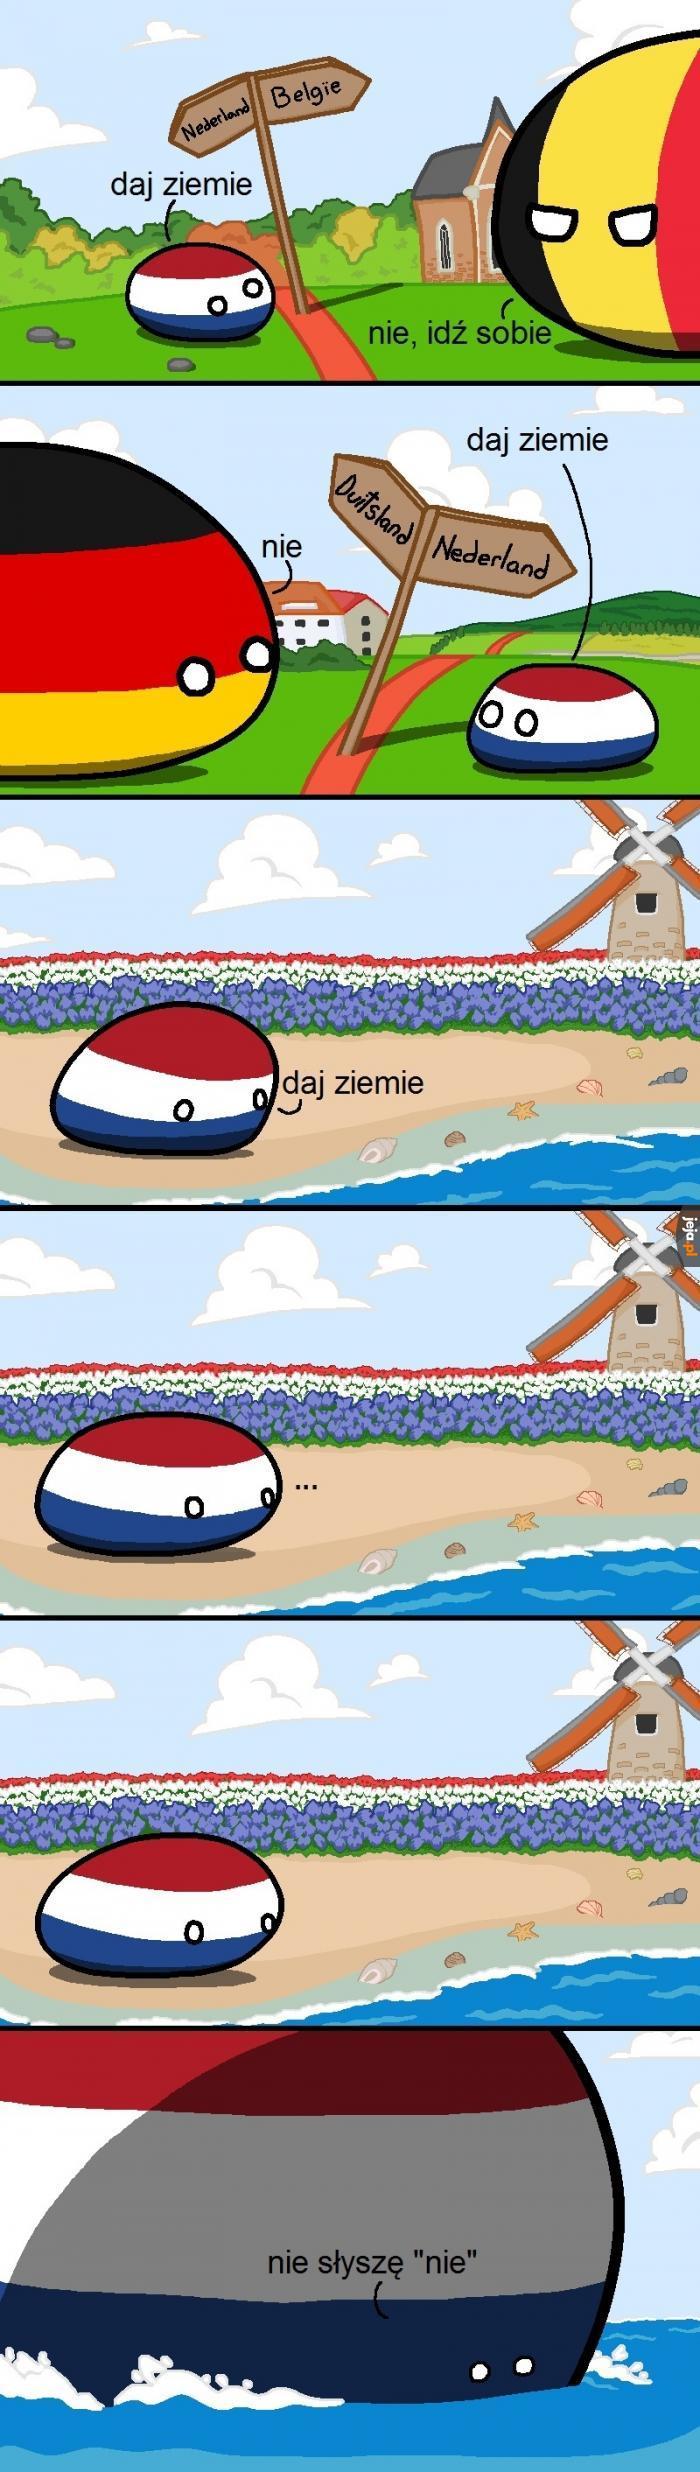 Jak Holendrzy zdobyli terytorium